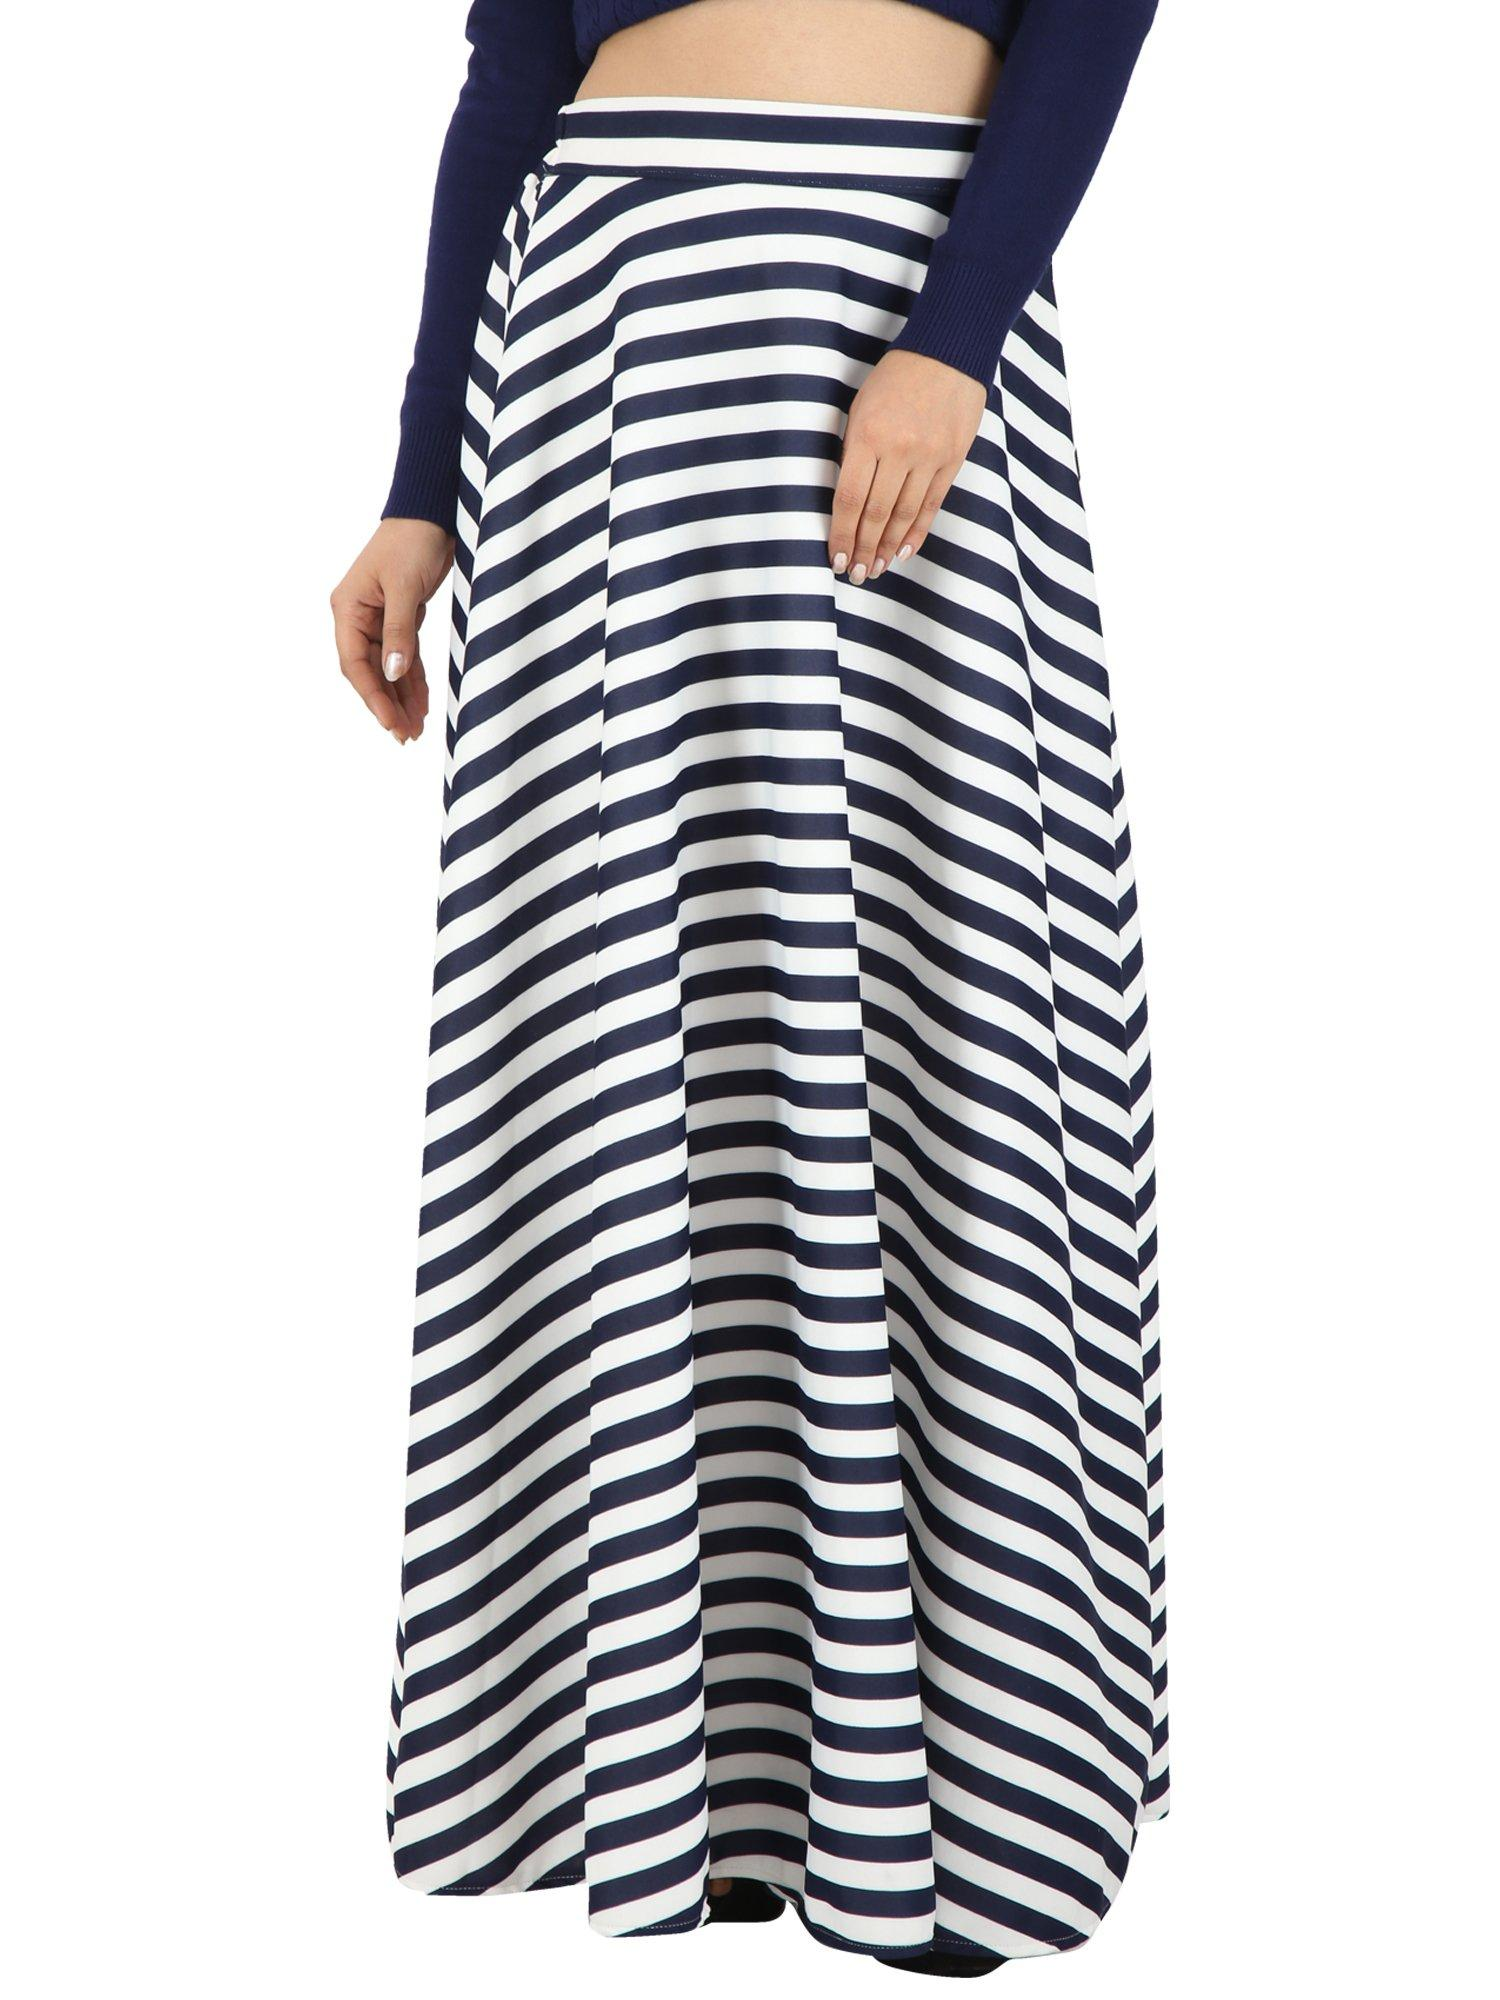 24b50ef1c5 Navy Blue Striped Skirt - SeenIt